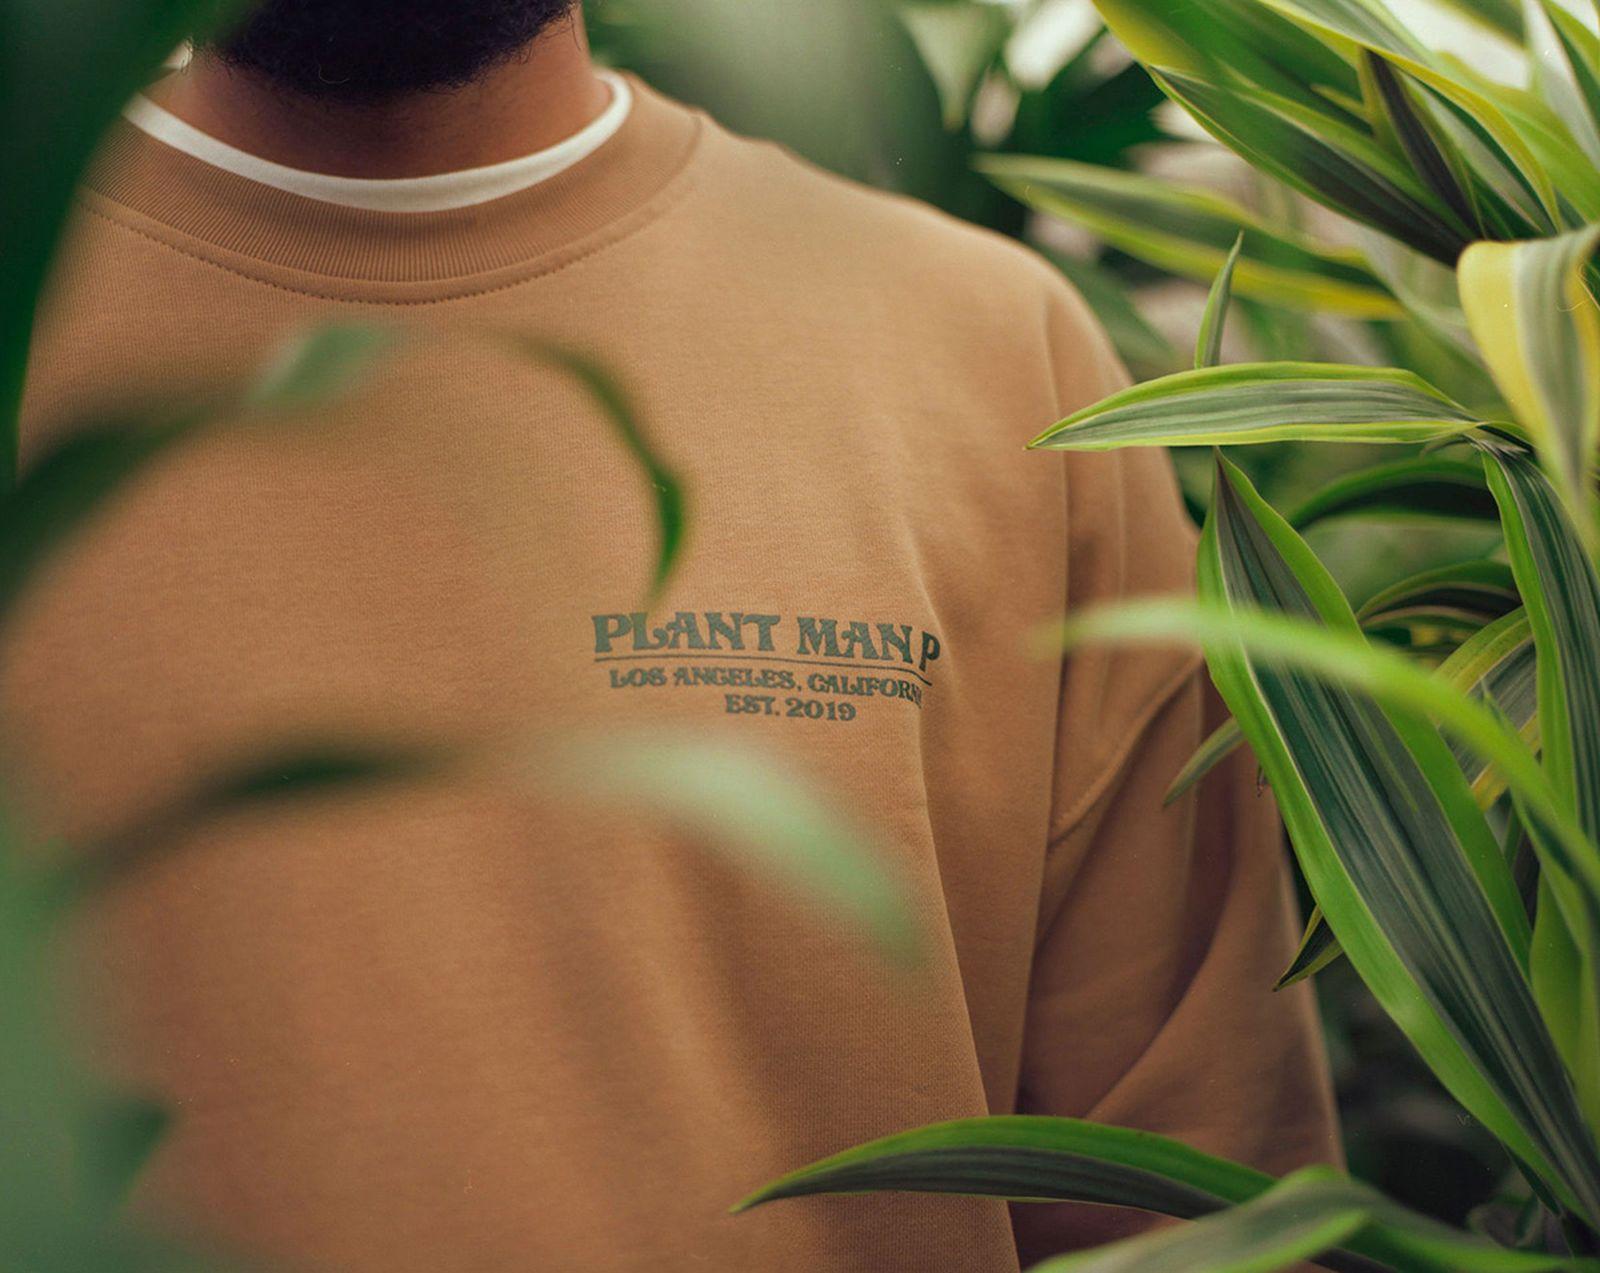 plant-man-p-hm-blank-staples-new-08